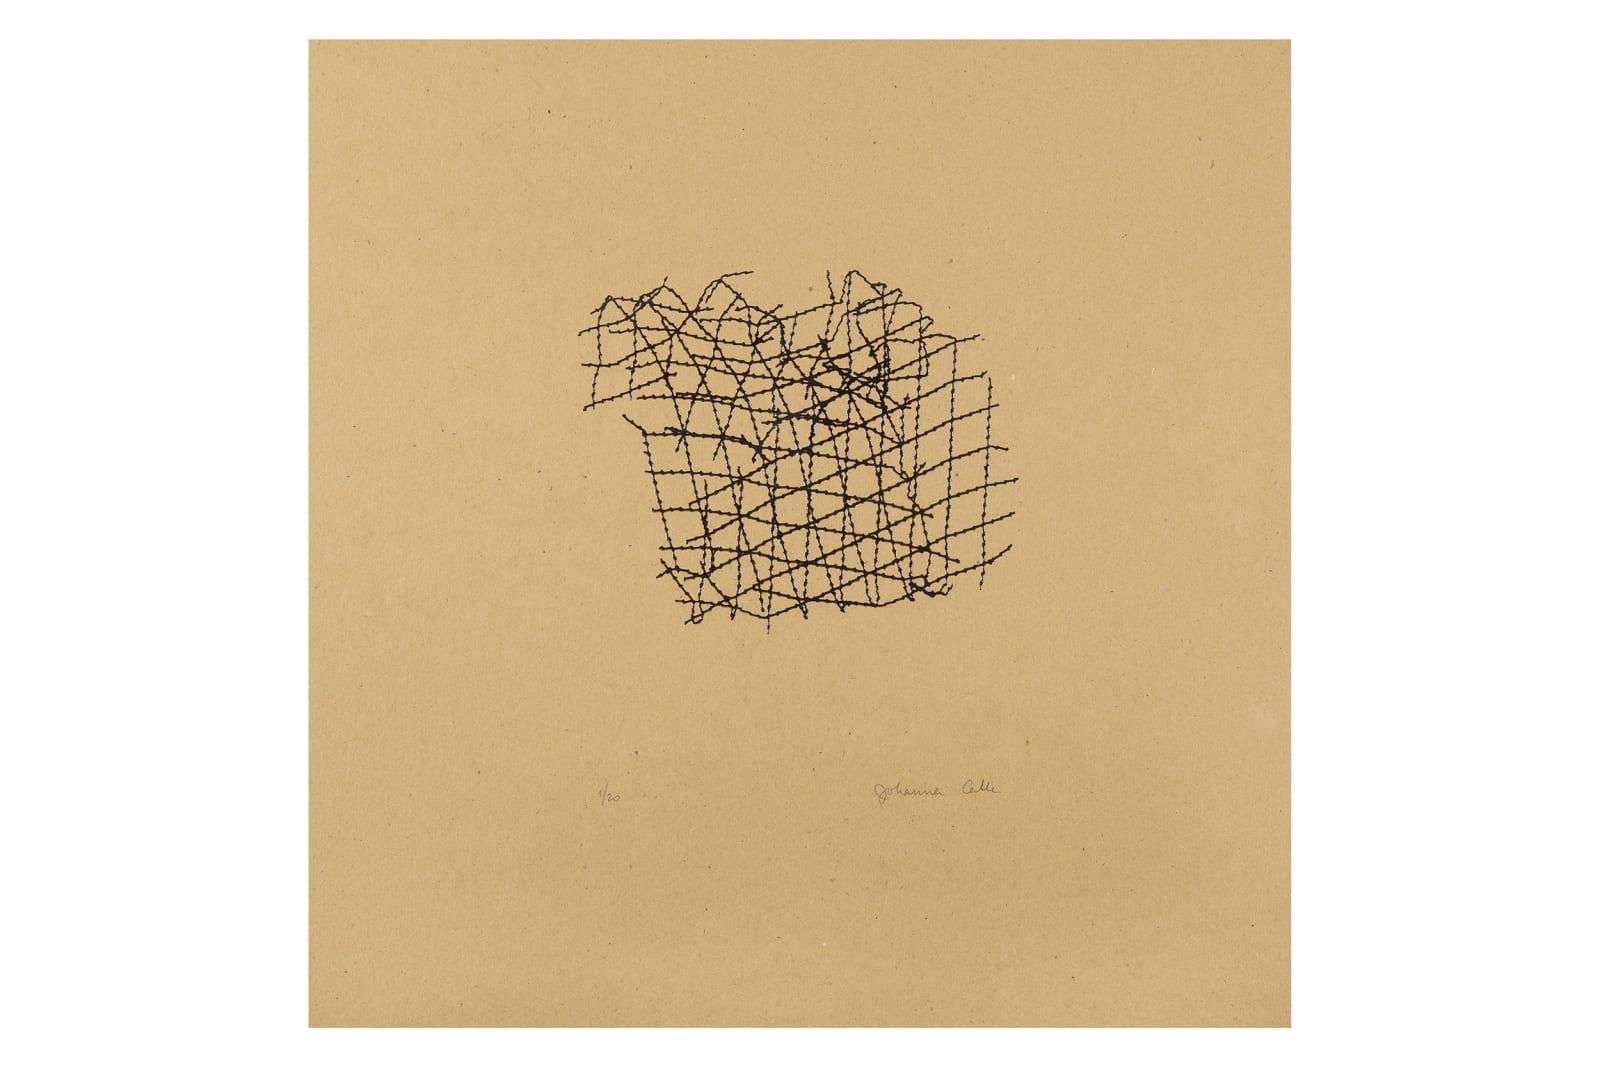 Johanna Calle Sin título (rejillas) Untitled (grids), 2016